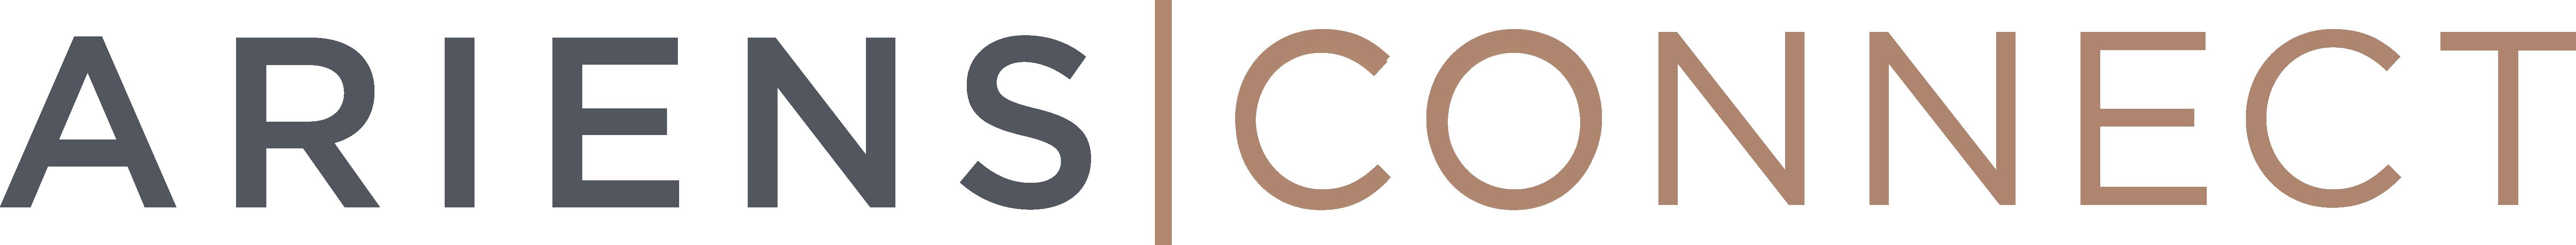 Ariens_Connect_Logo_FINAL-web